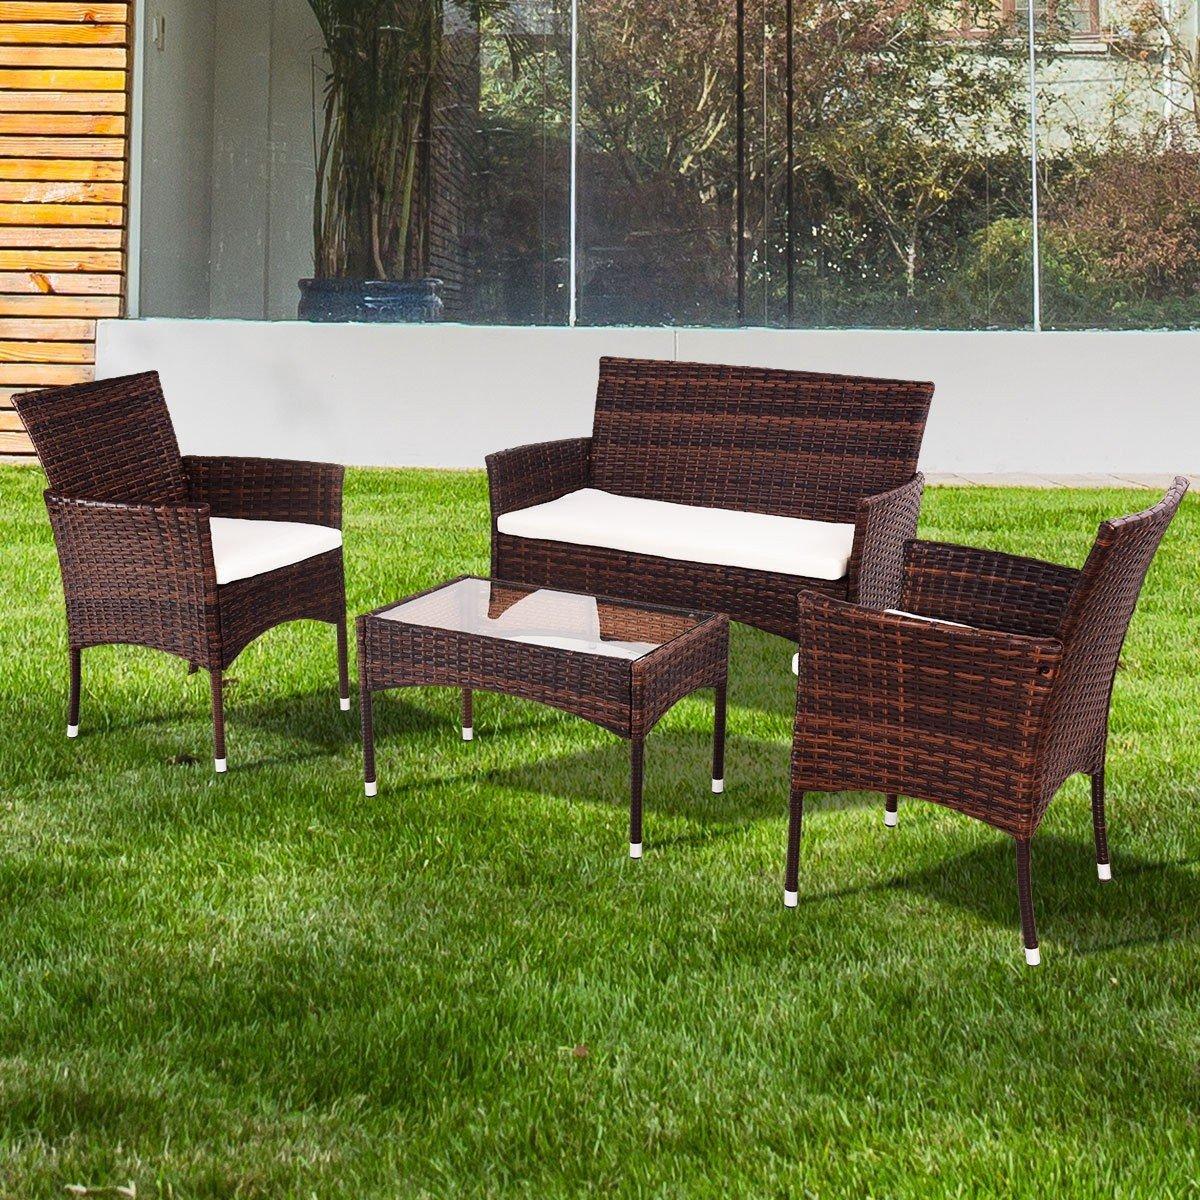 EnjoyShop 4 Pcs PE Rattan Wicker Table Shelf Sofa Furniture Set with Cushion Dining Garden Picnic Outdoor by EnjoyShop (Image #3)